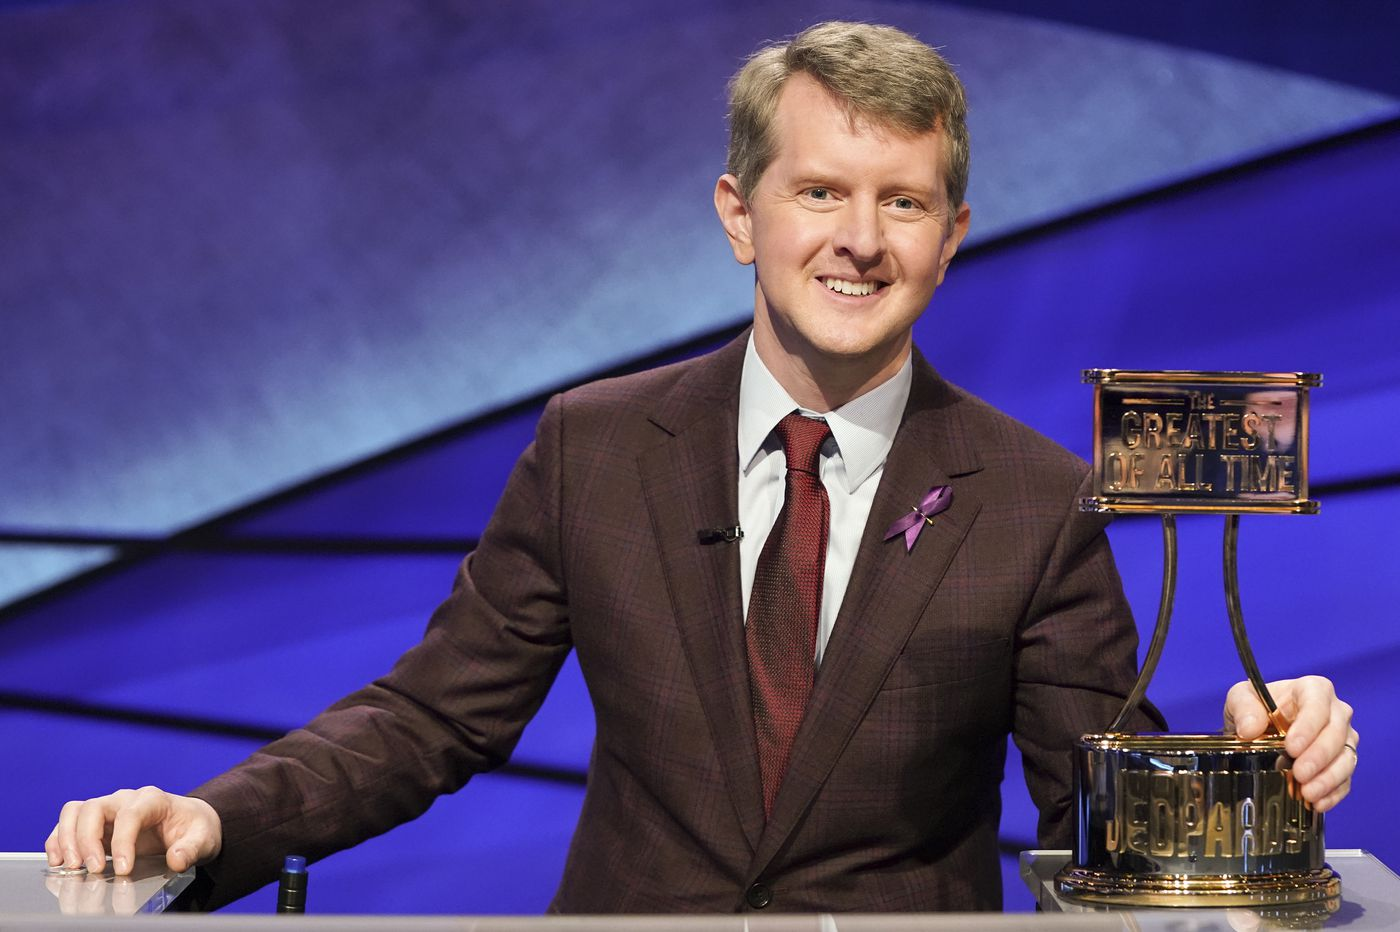 'Jeopardy!' mega-champion Ken Jennings not open to rematch